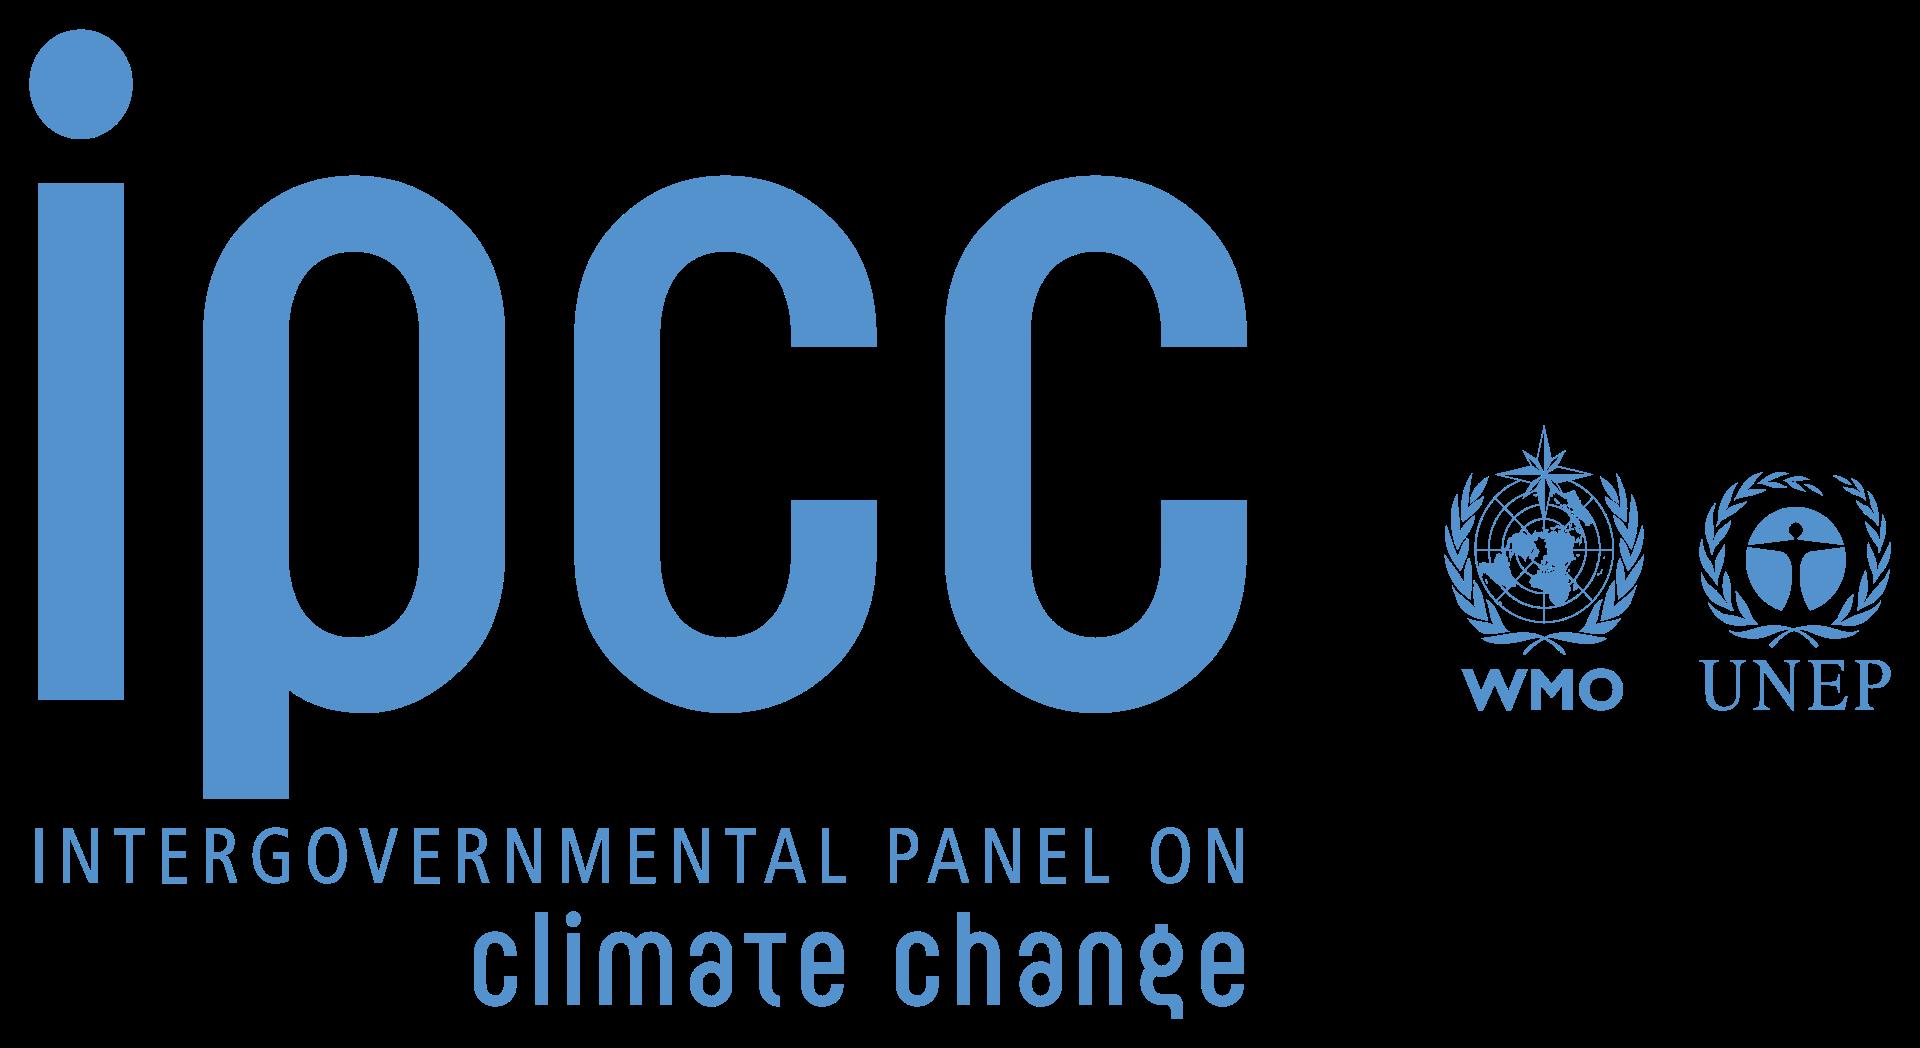 logo của IPCC